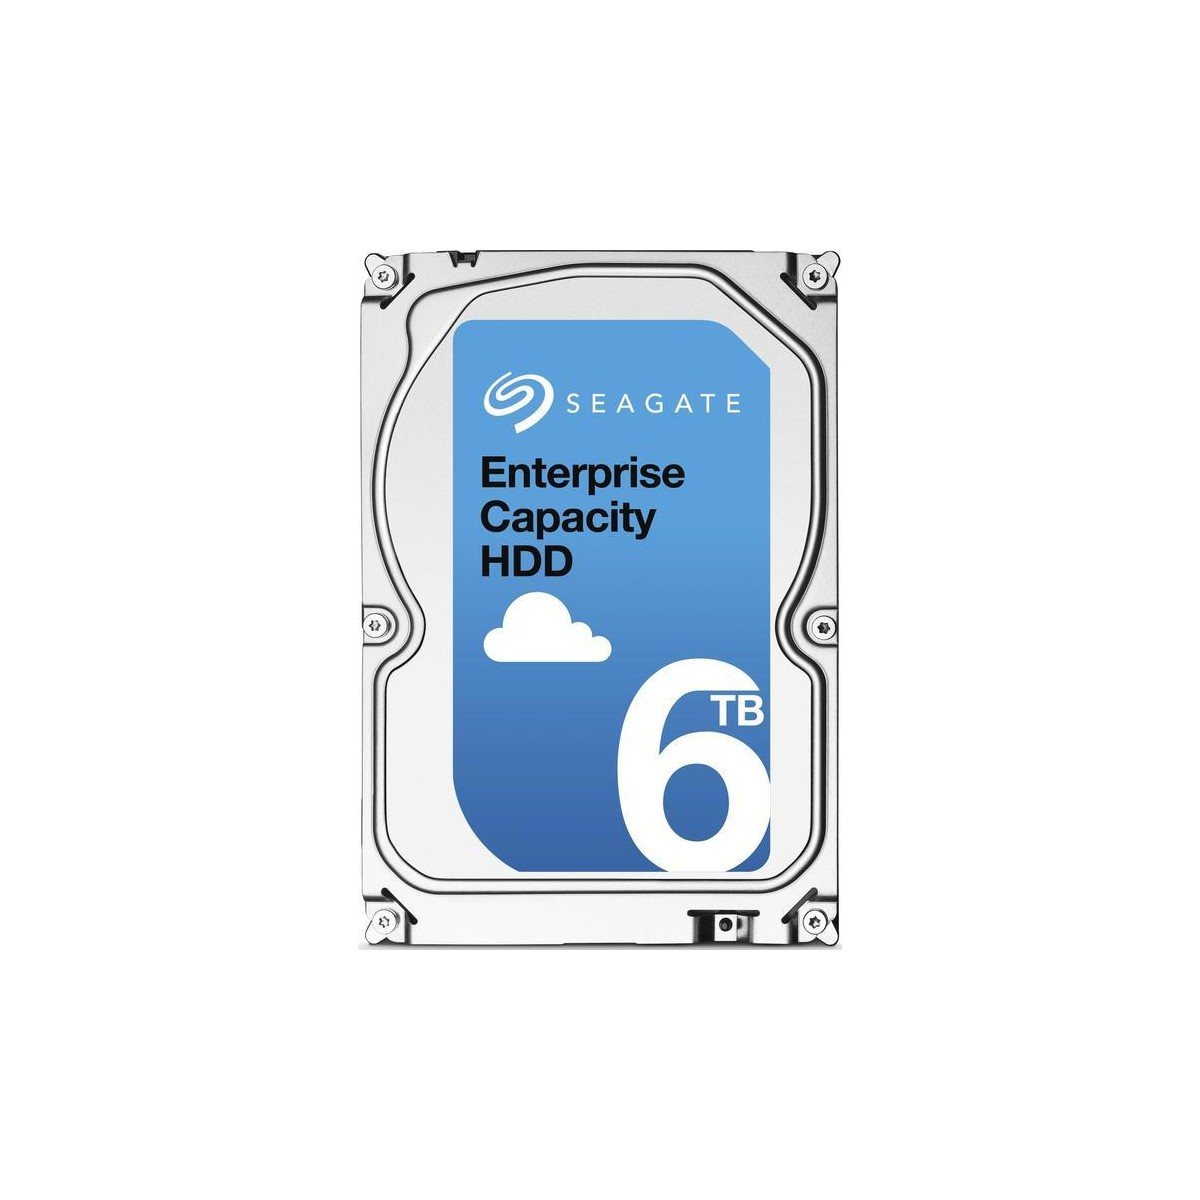 "Seagate ST6000NM0115 6 TB 3.5"" Internal Hard Drive 7200rpm 256 MB Buffer by Seagate"